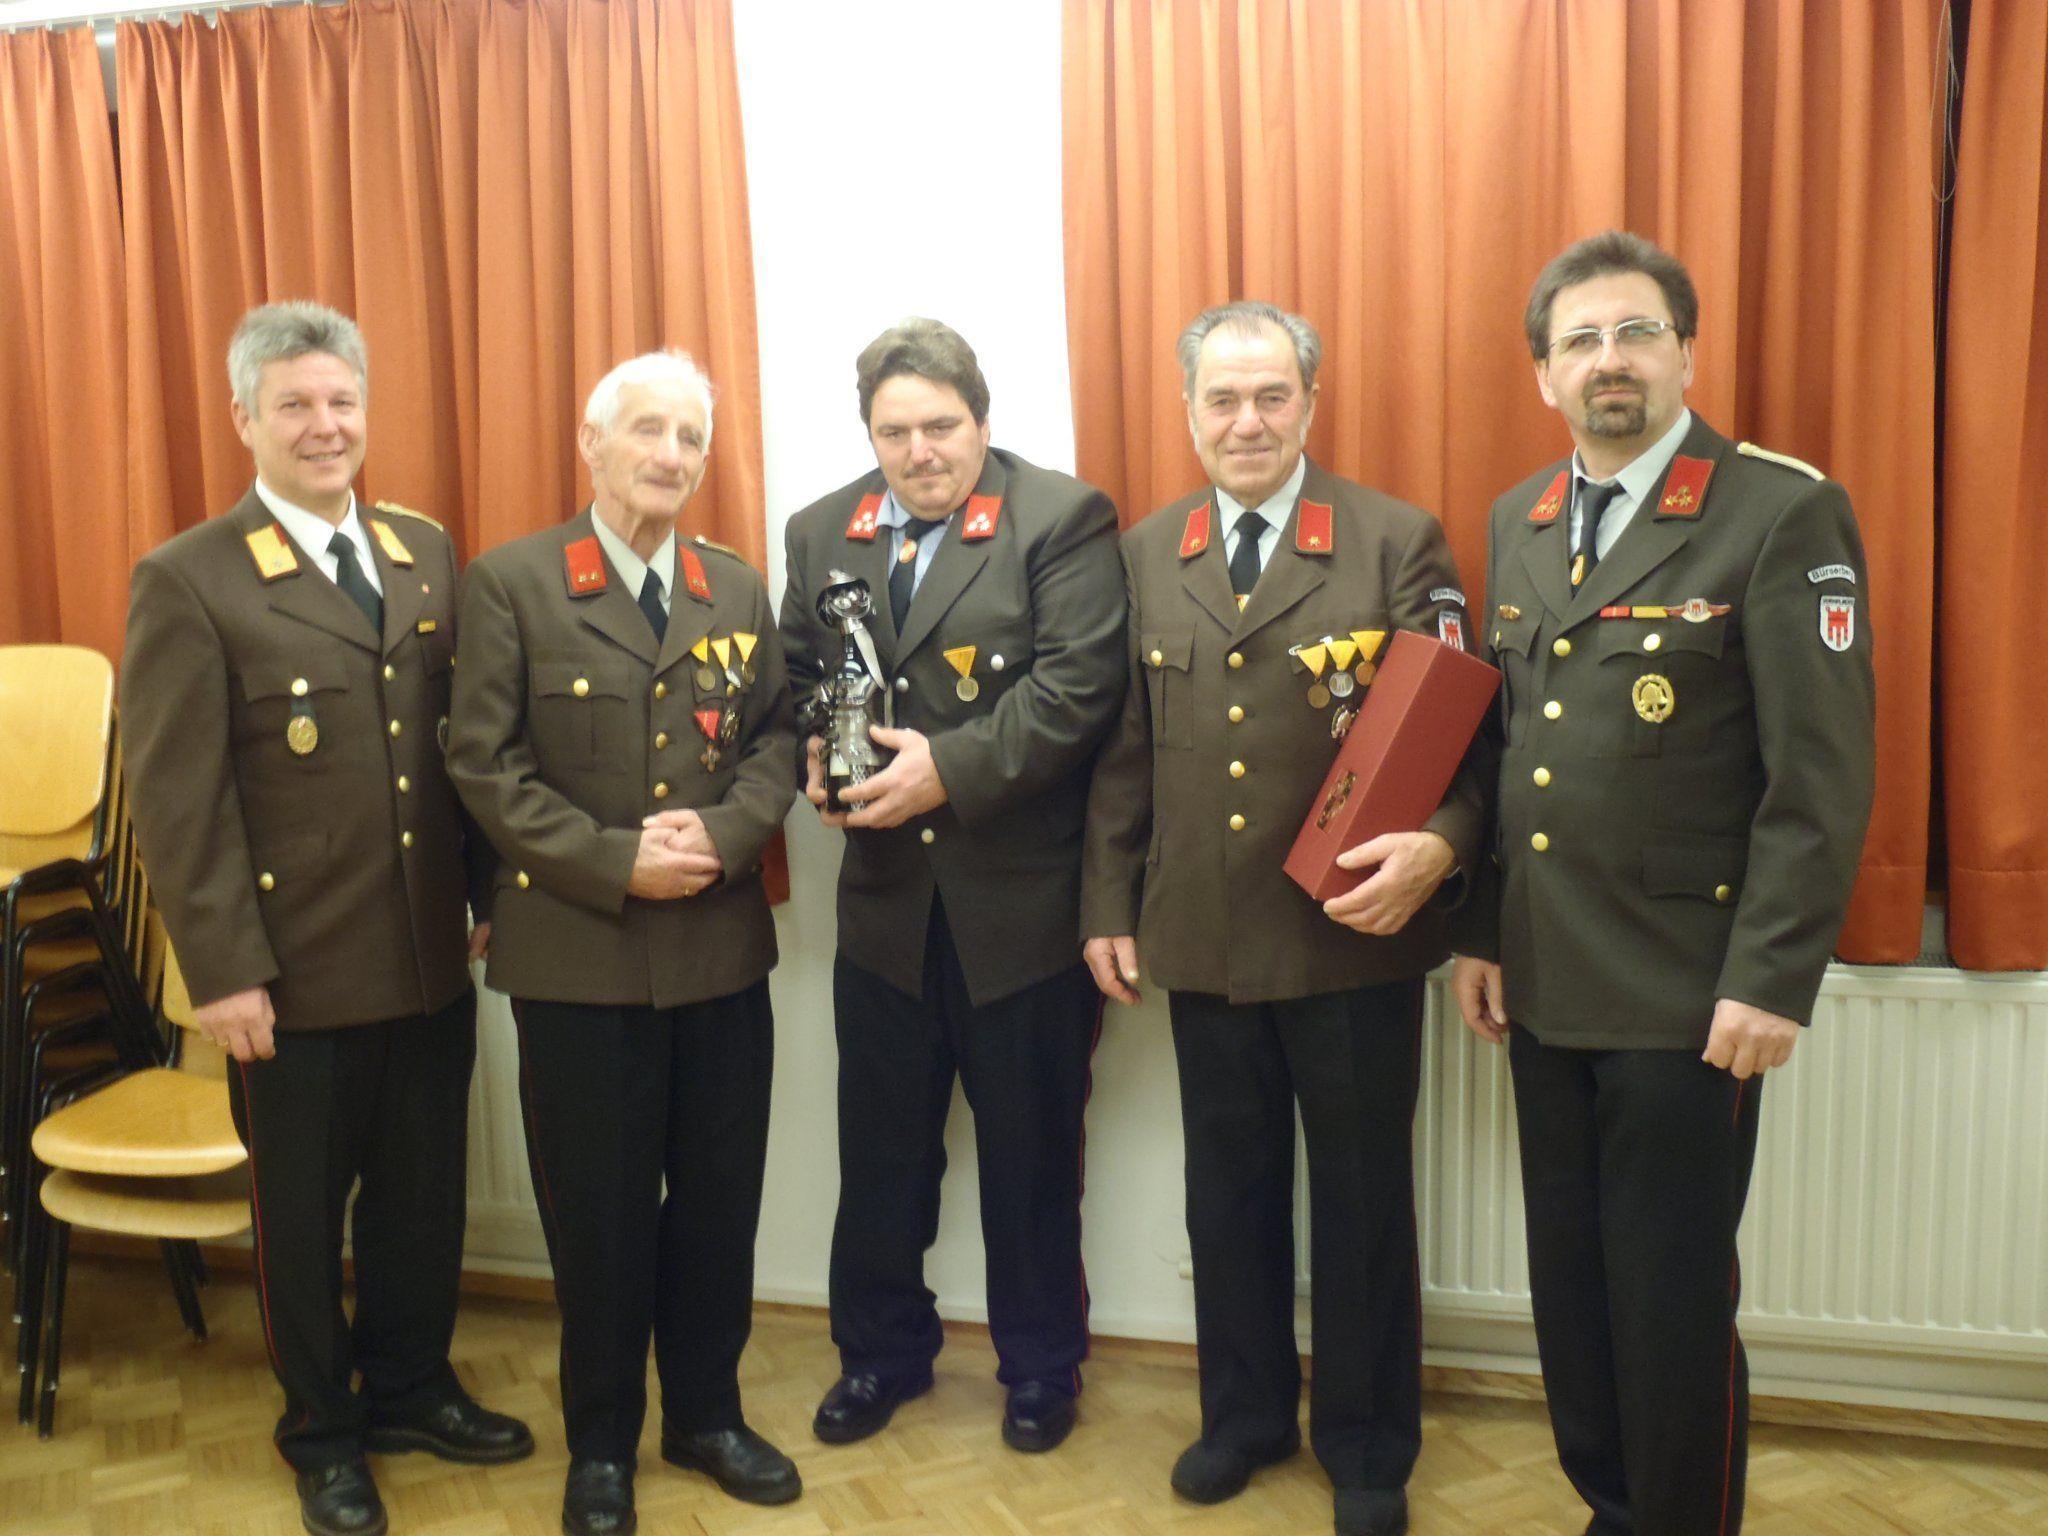 AFK Oberhauser, Ehrenkommandant Schallert, Neier Michae (25 Jahre)l, Neier Ernst, Kdt. Wehinger